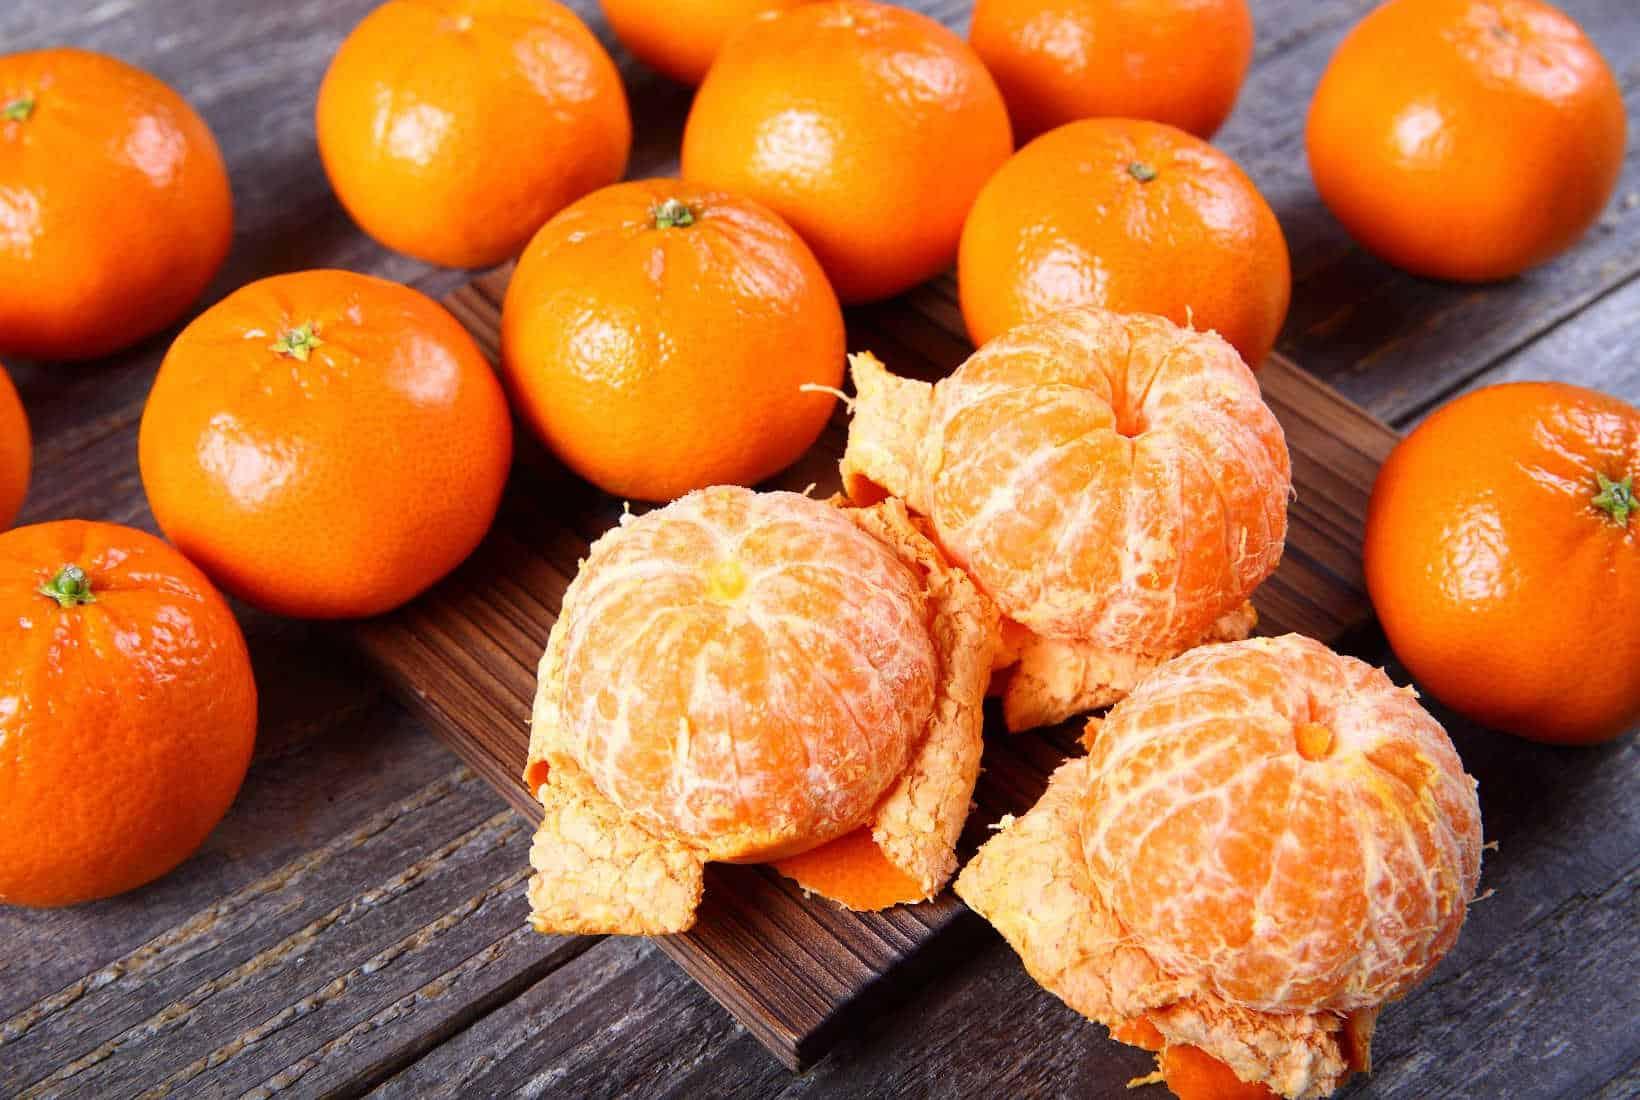 tangerines image from shutterstock